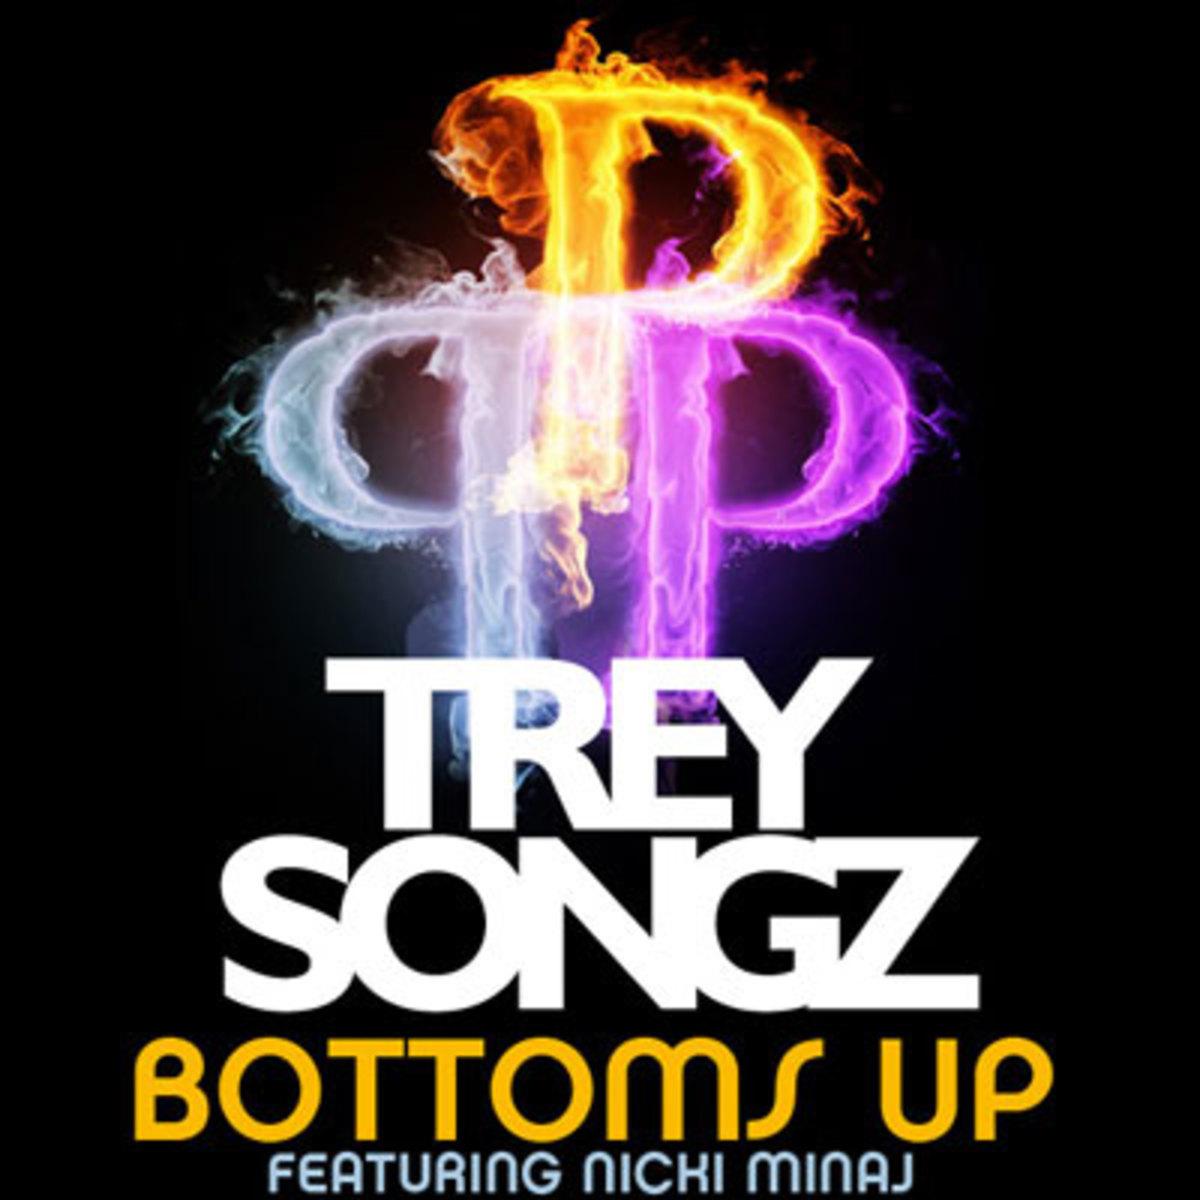 treysongz-bottomsup.jpg